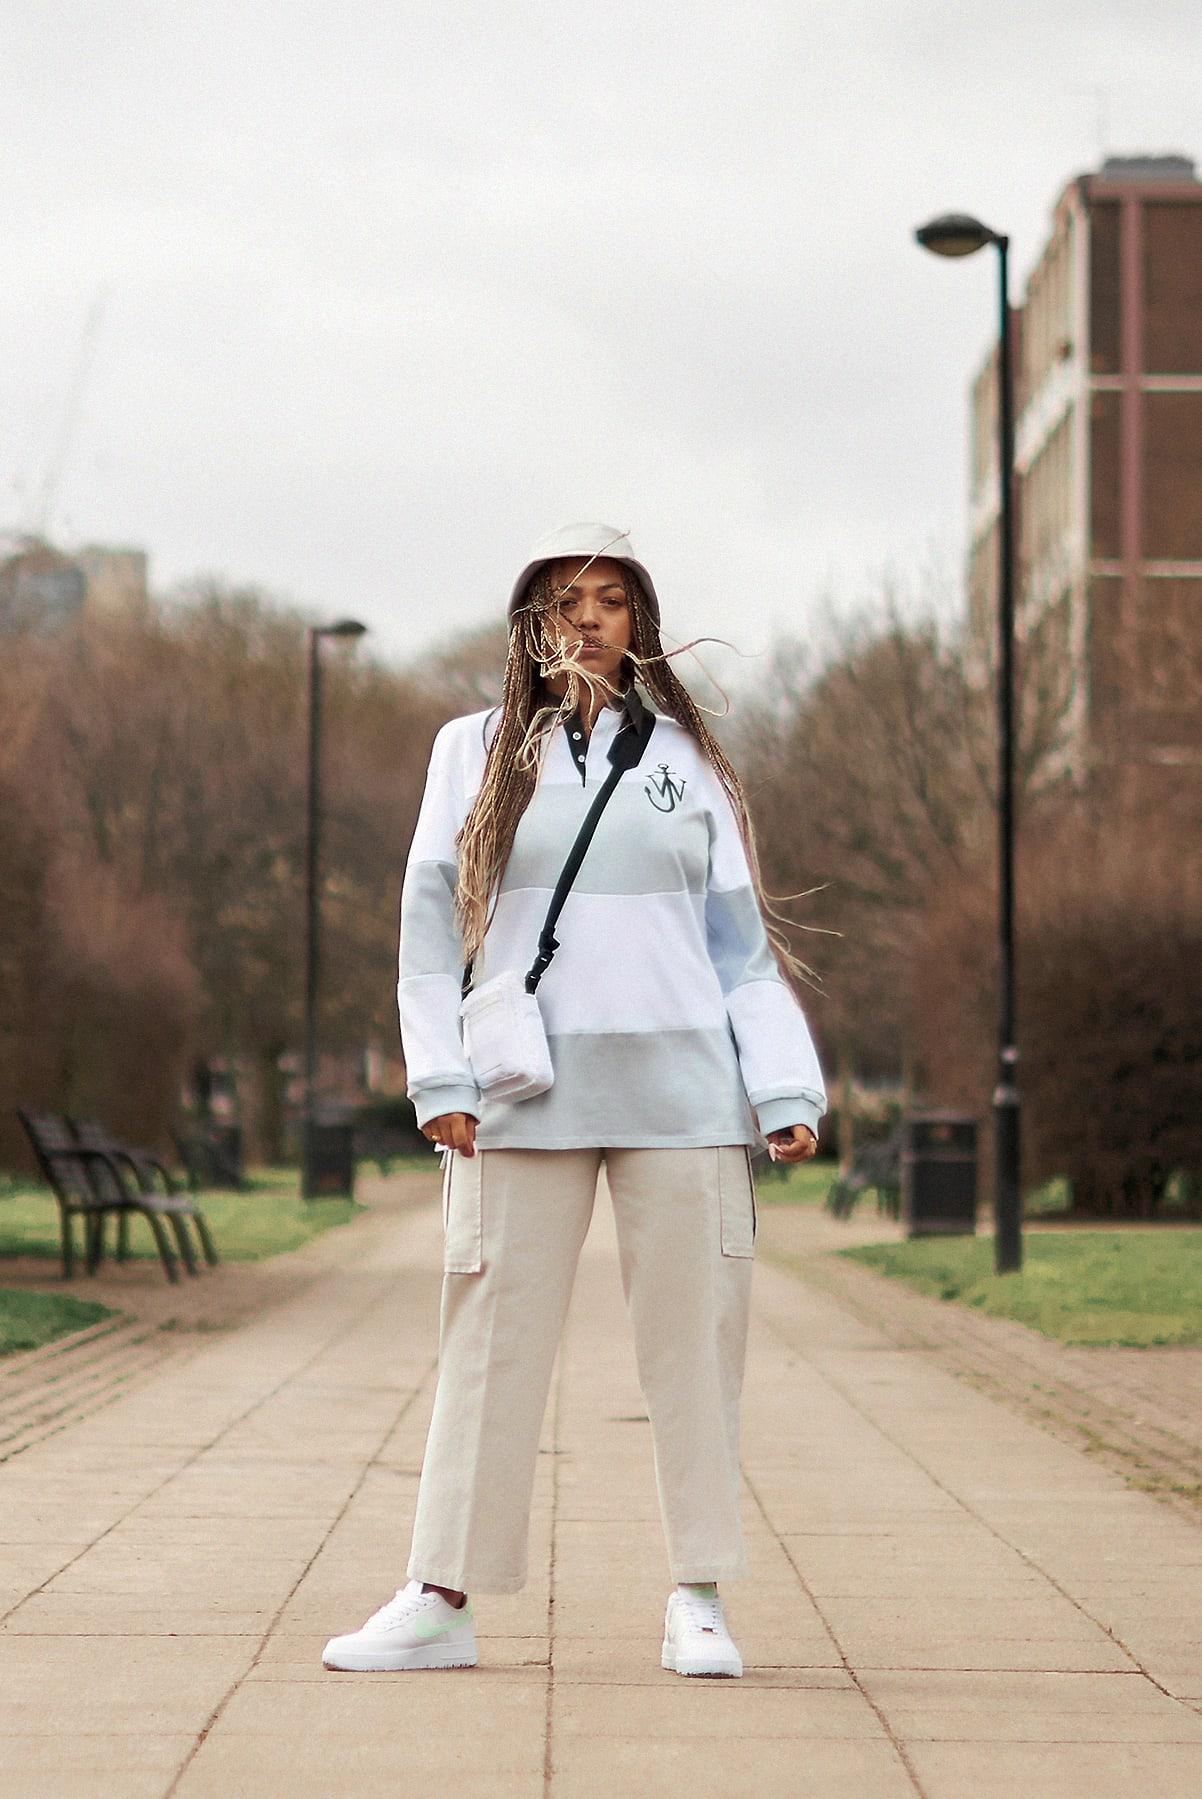 Mahalia wears JW Anderson, Acne Studios